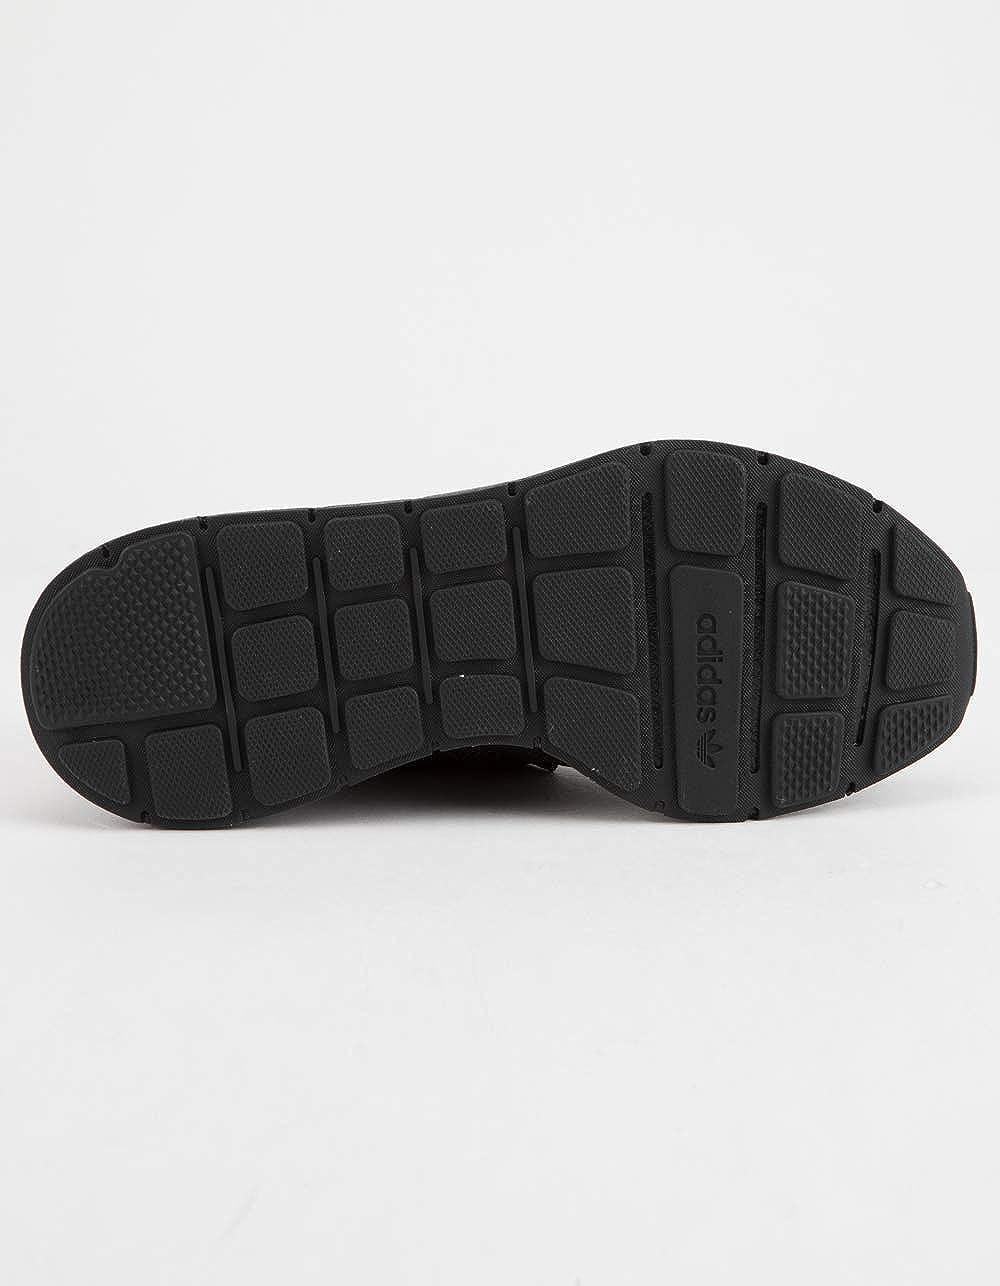 uk availability 1fda1 d704a Amazon.com  adidas Originals Kids Swift Run J Sneaker  Sneak